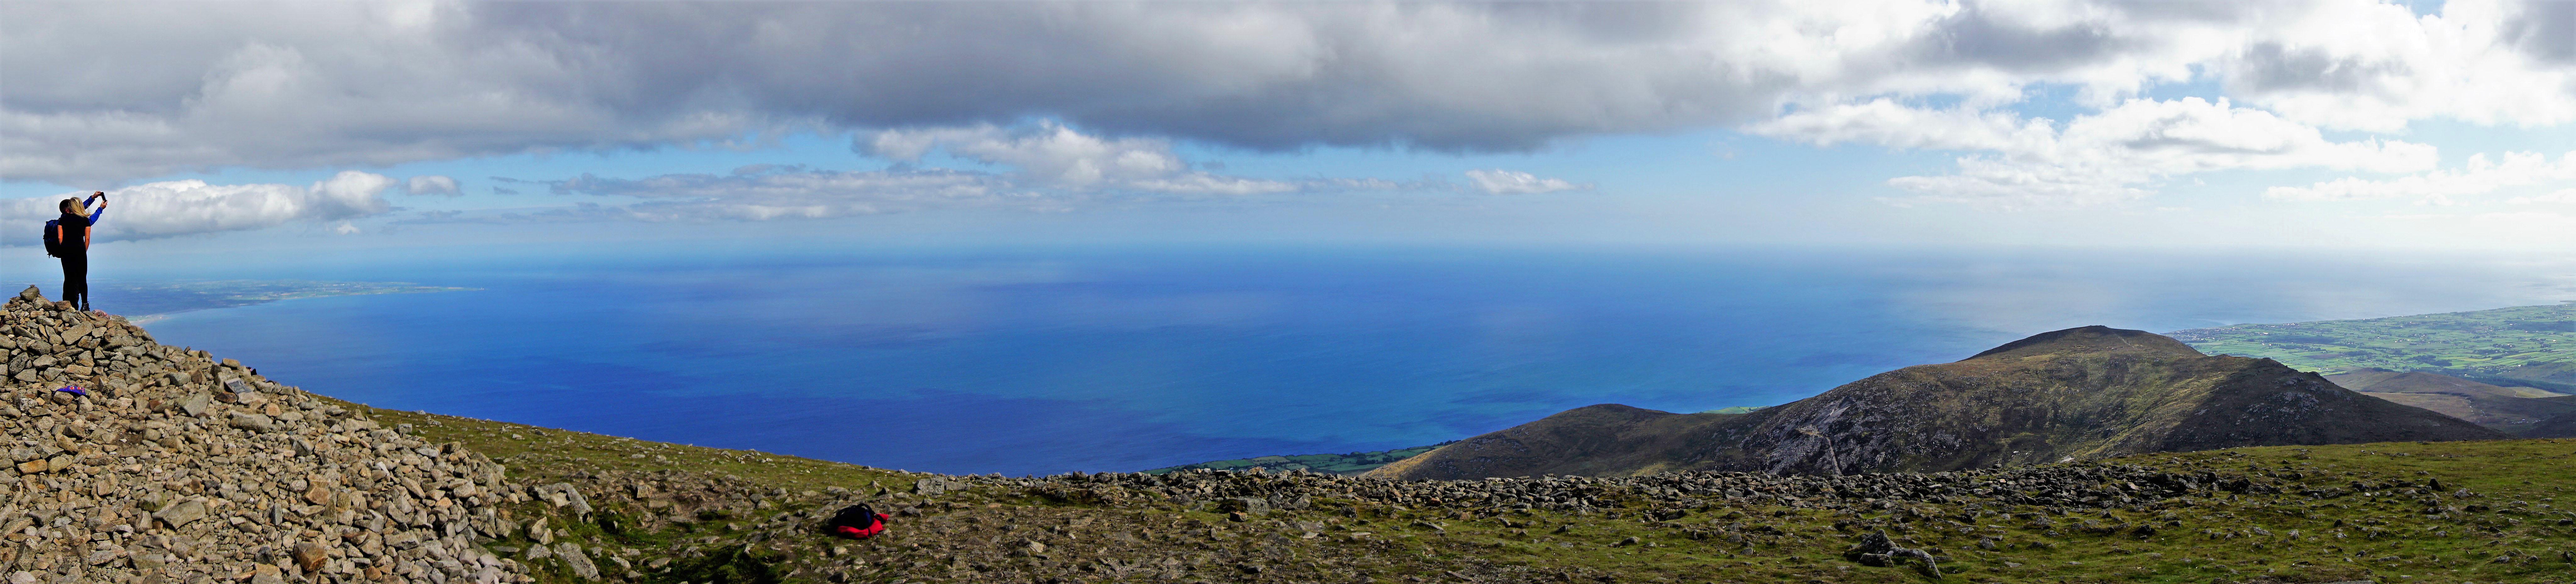 Slieve Donard peak.